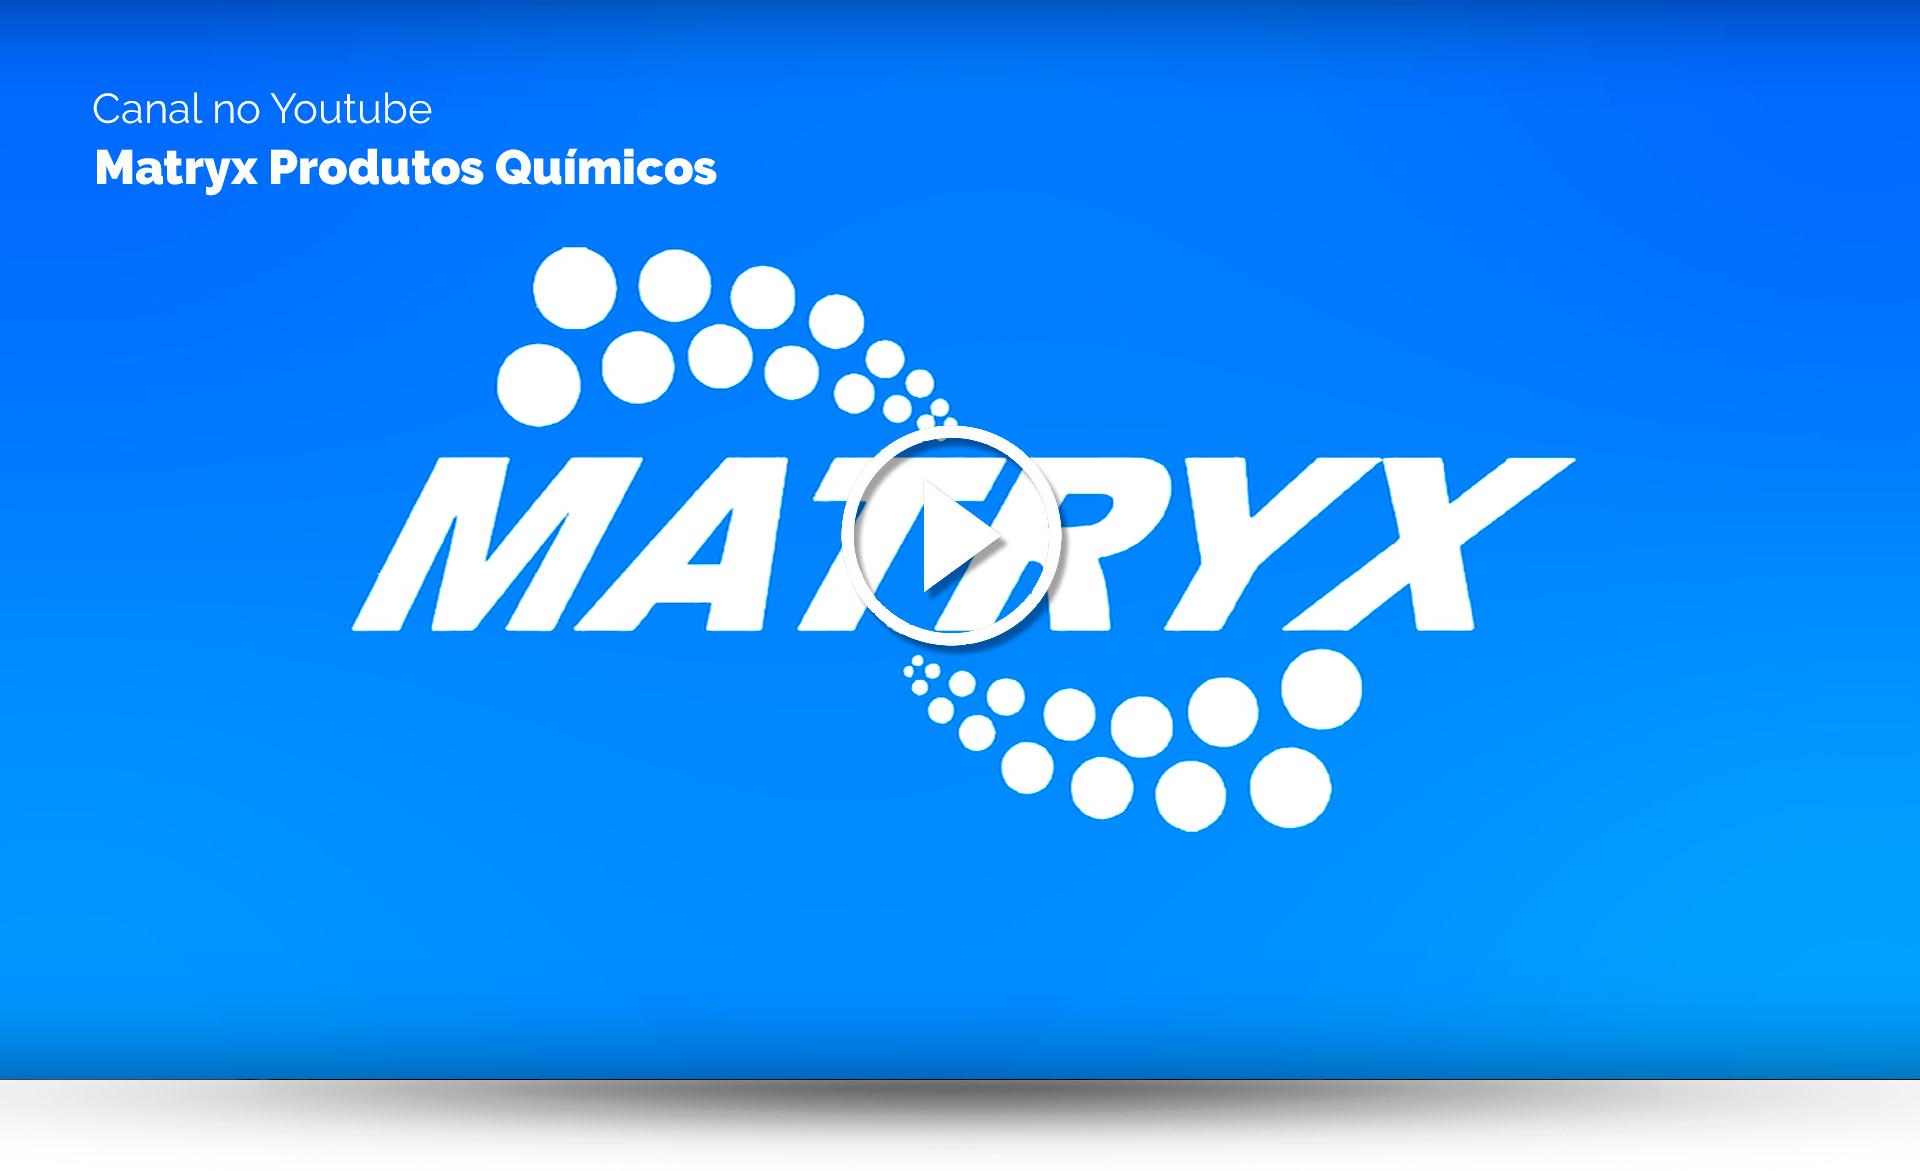 Matryx Produtos Químicos